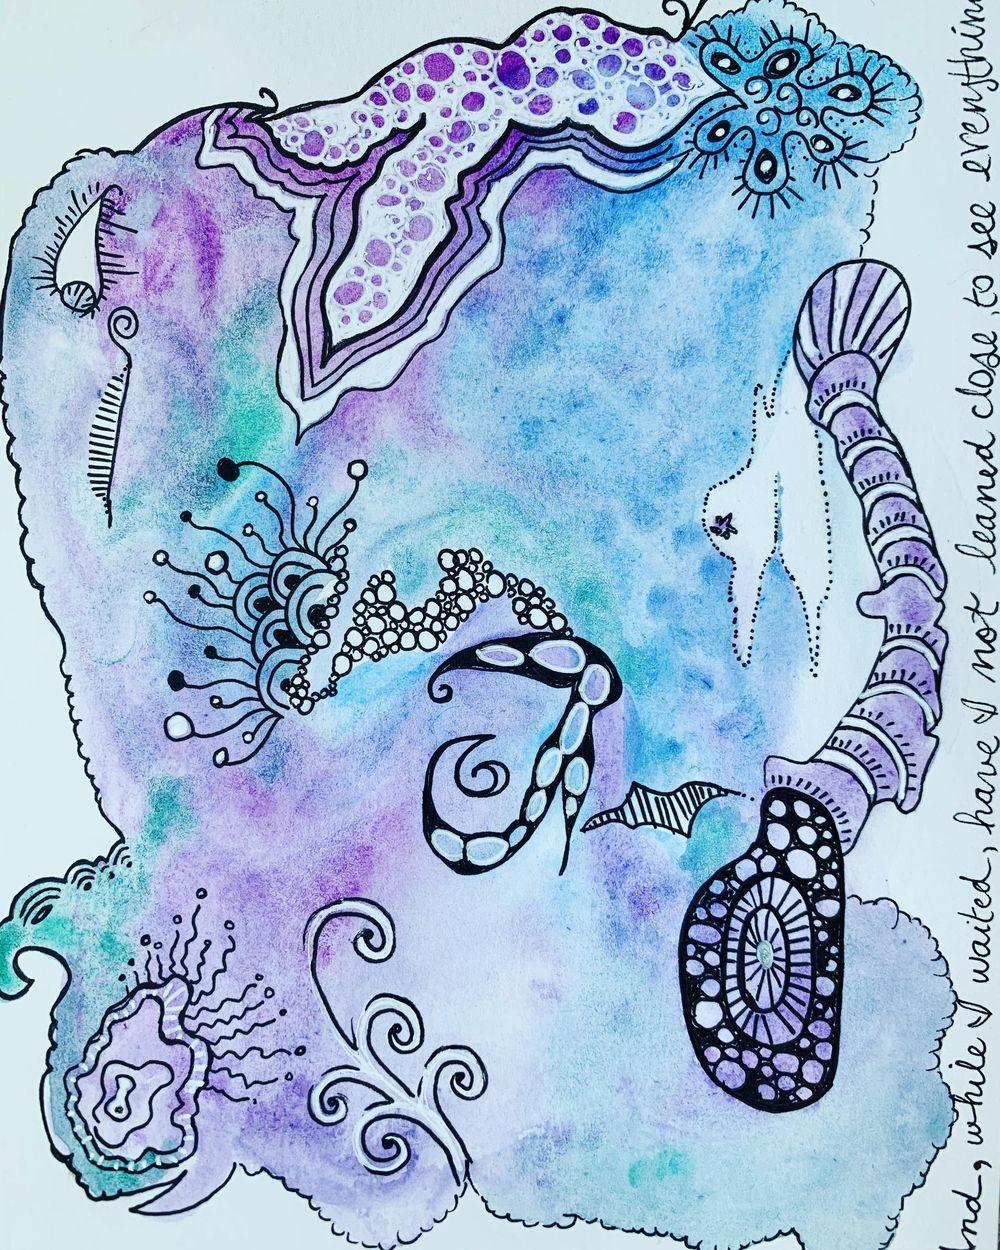 Zen Doodle Exercise - image 1 - student project